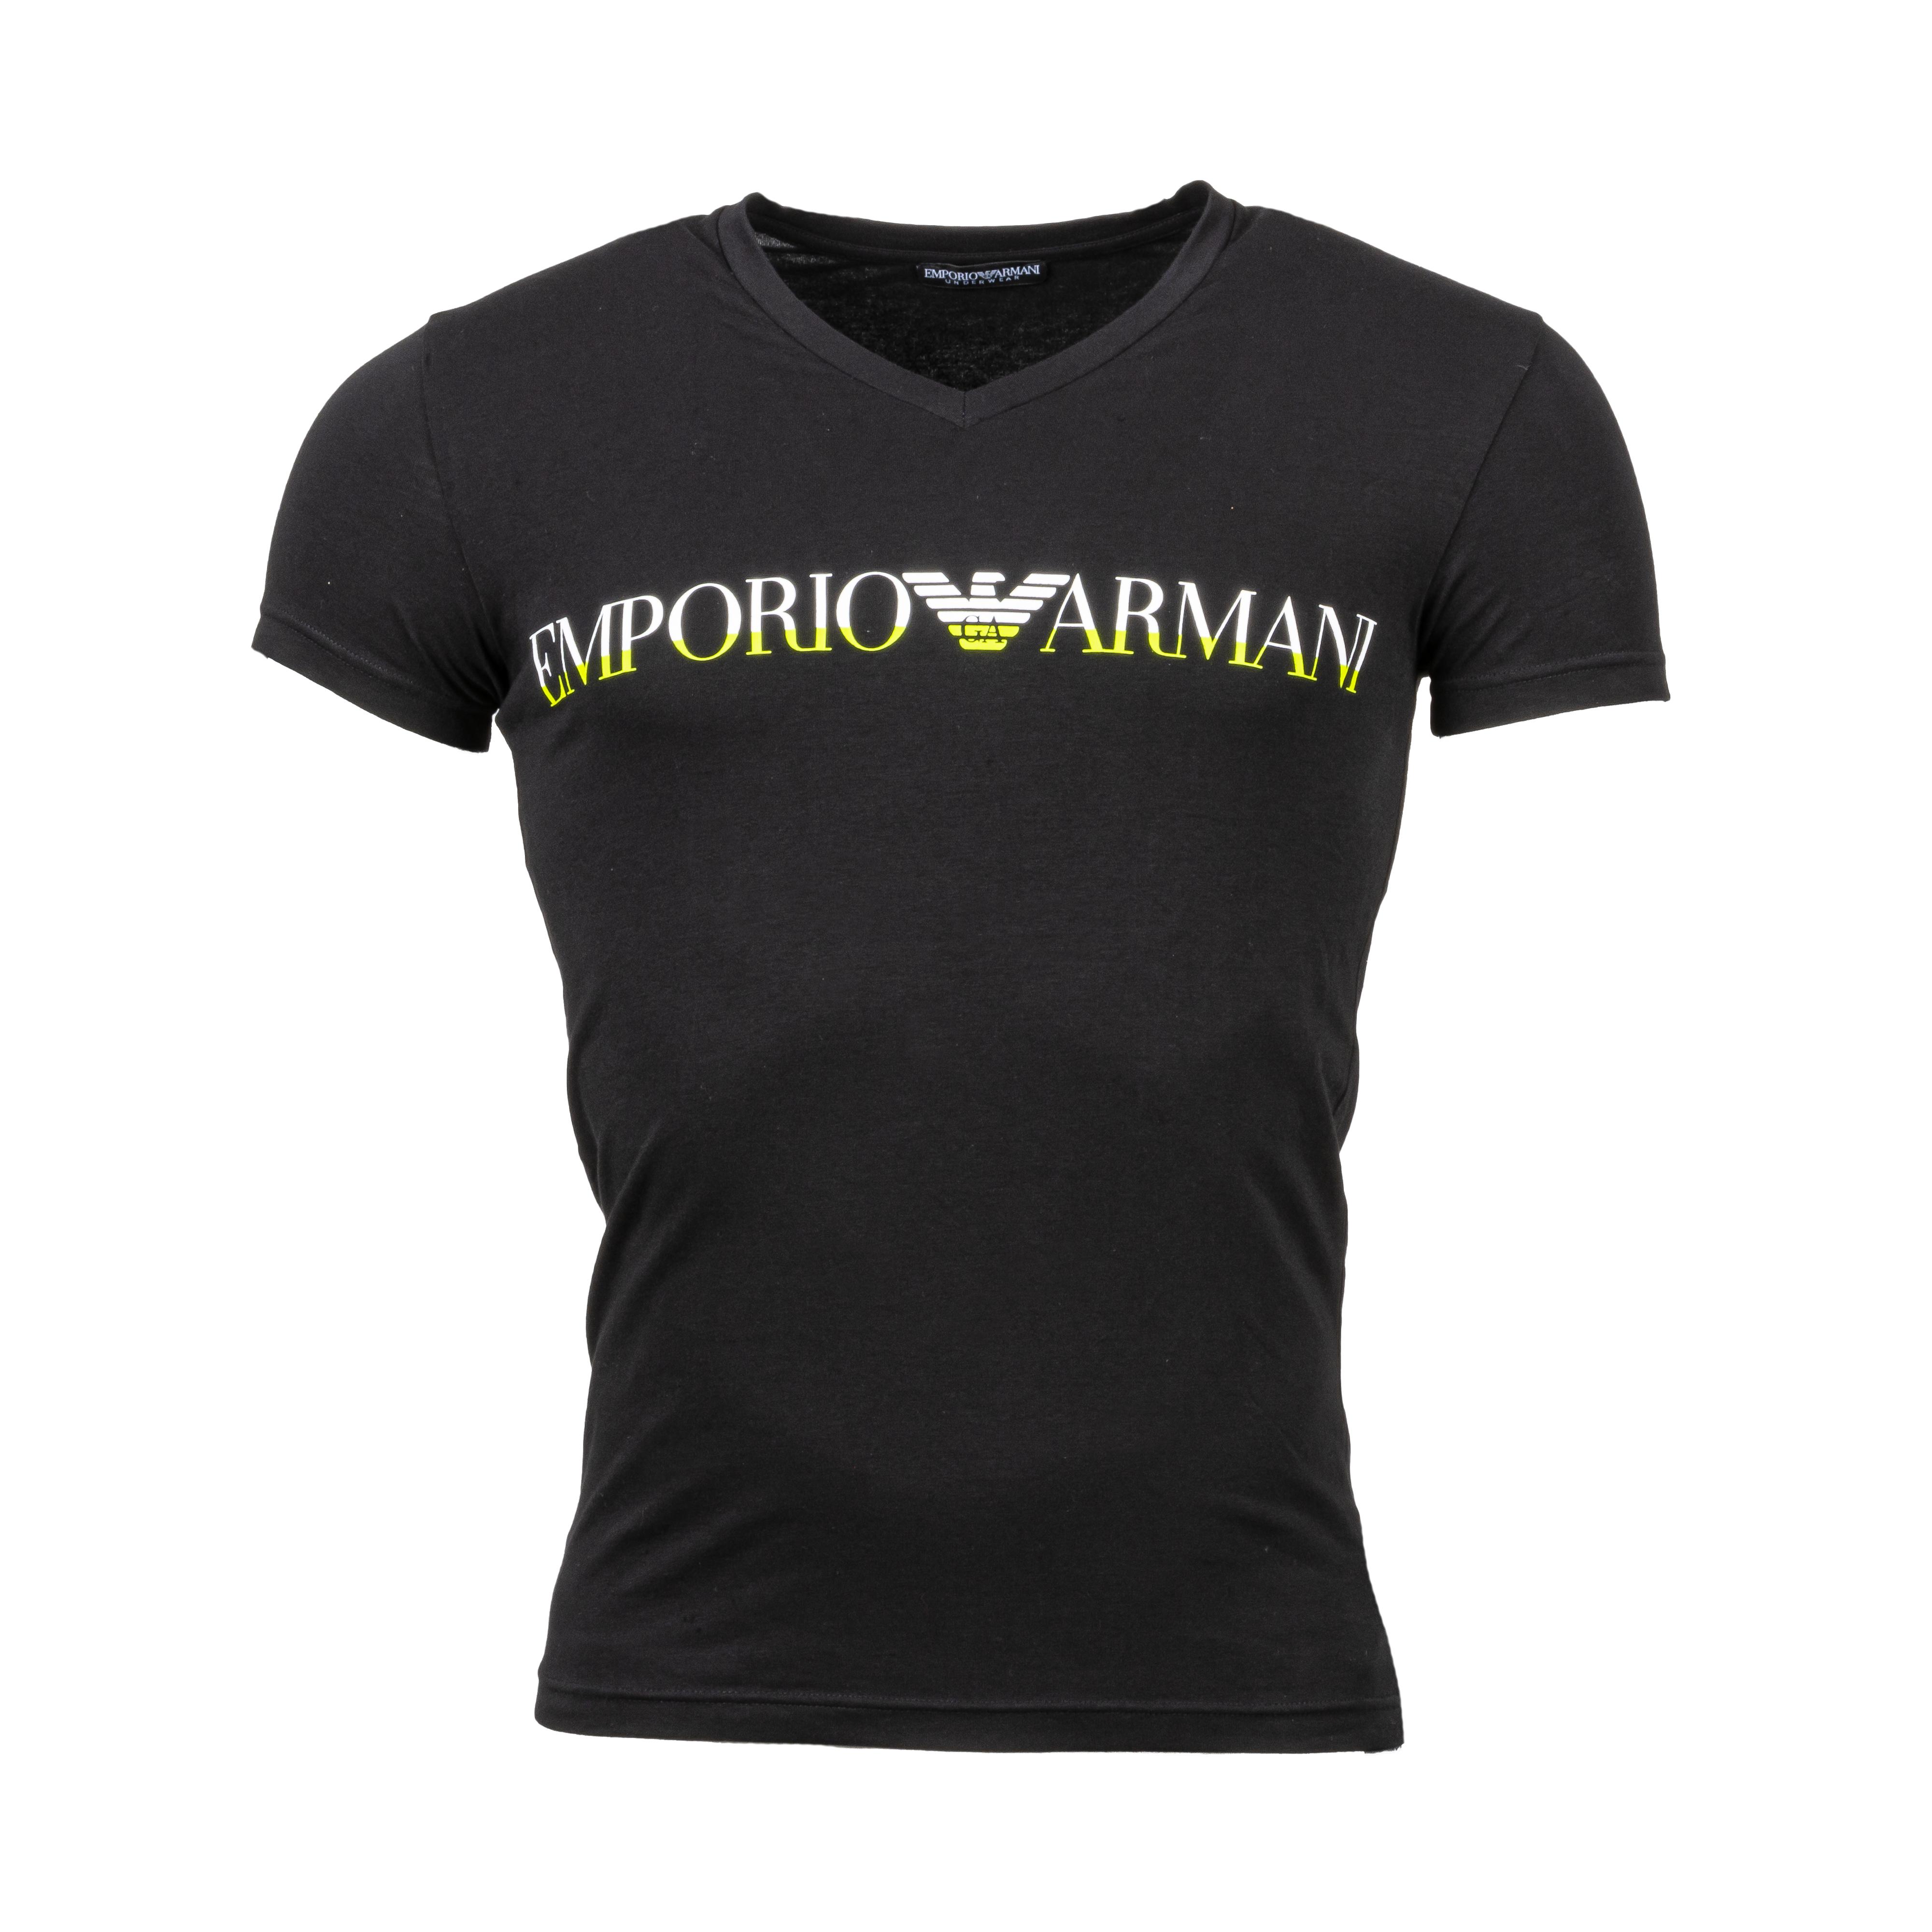 Tee-shirt col v  en coton stretch noir floqué